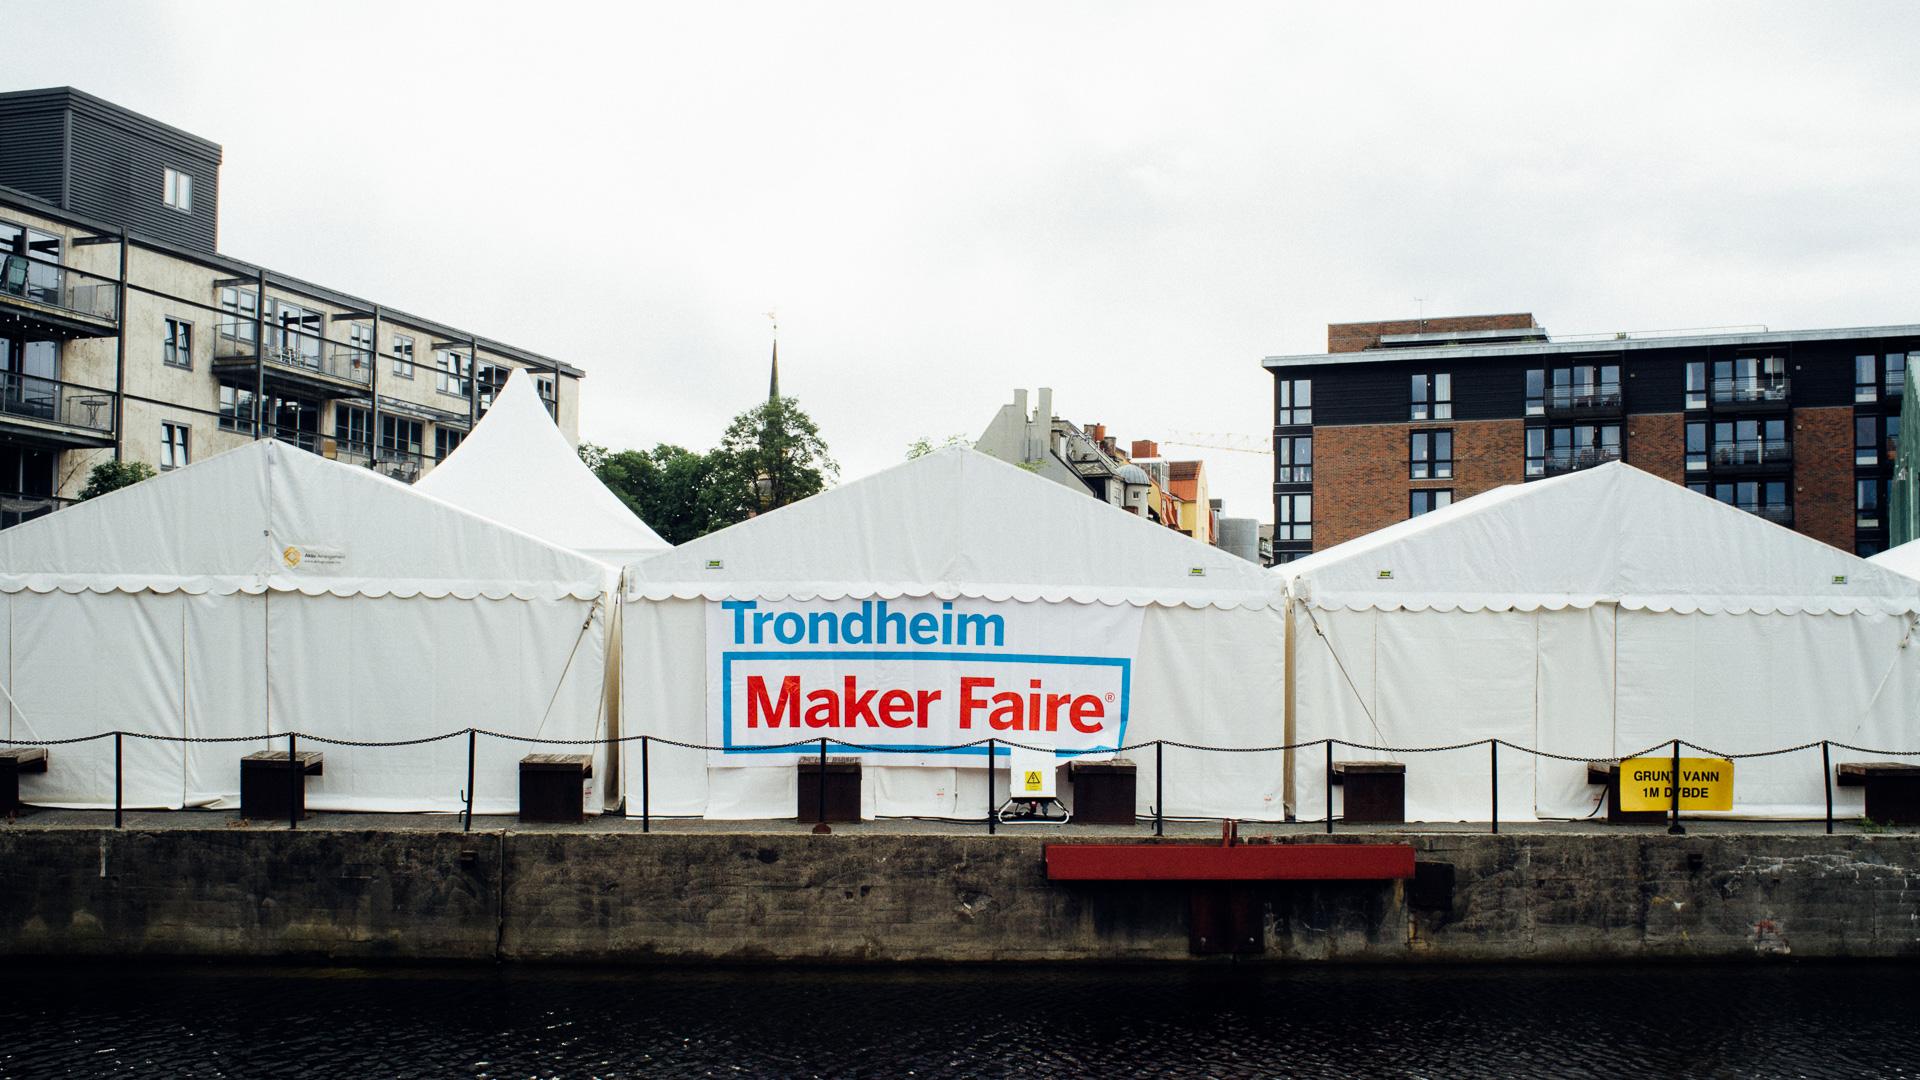 Trondheim Maker Faire 2017